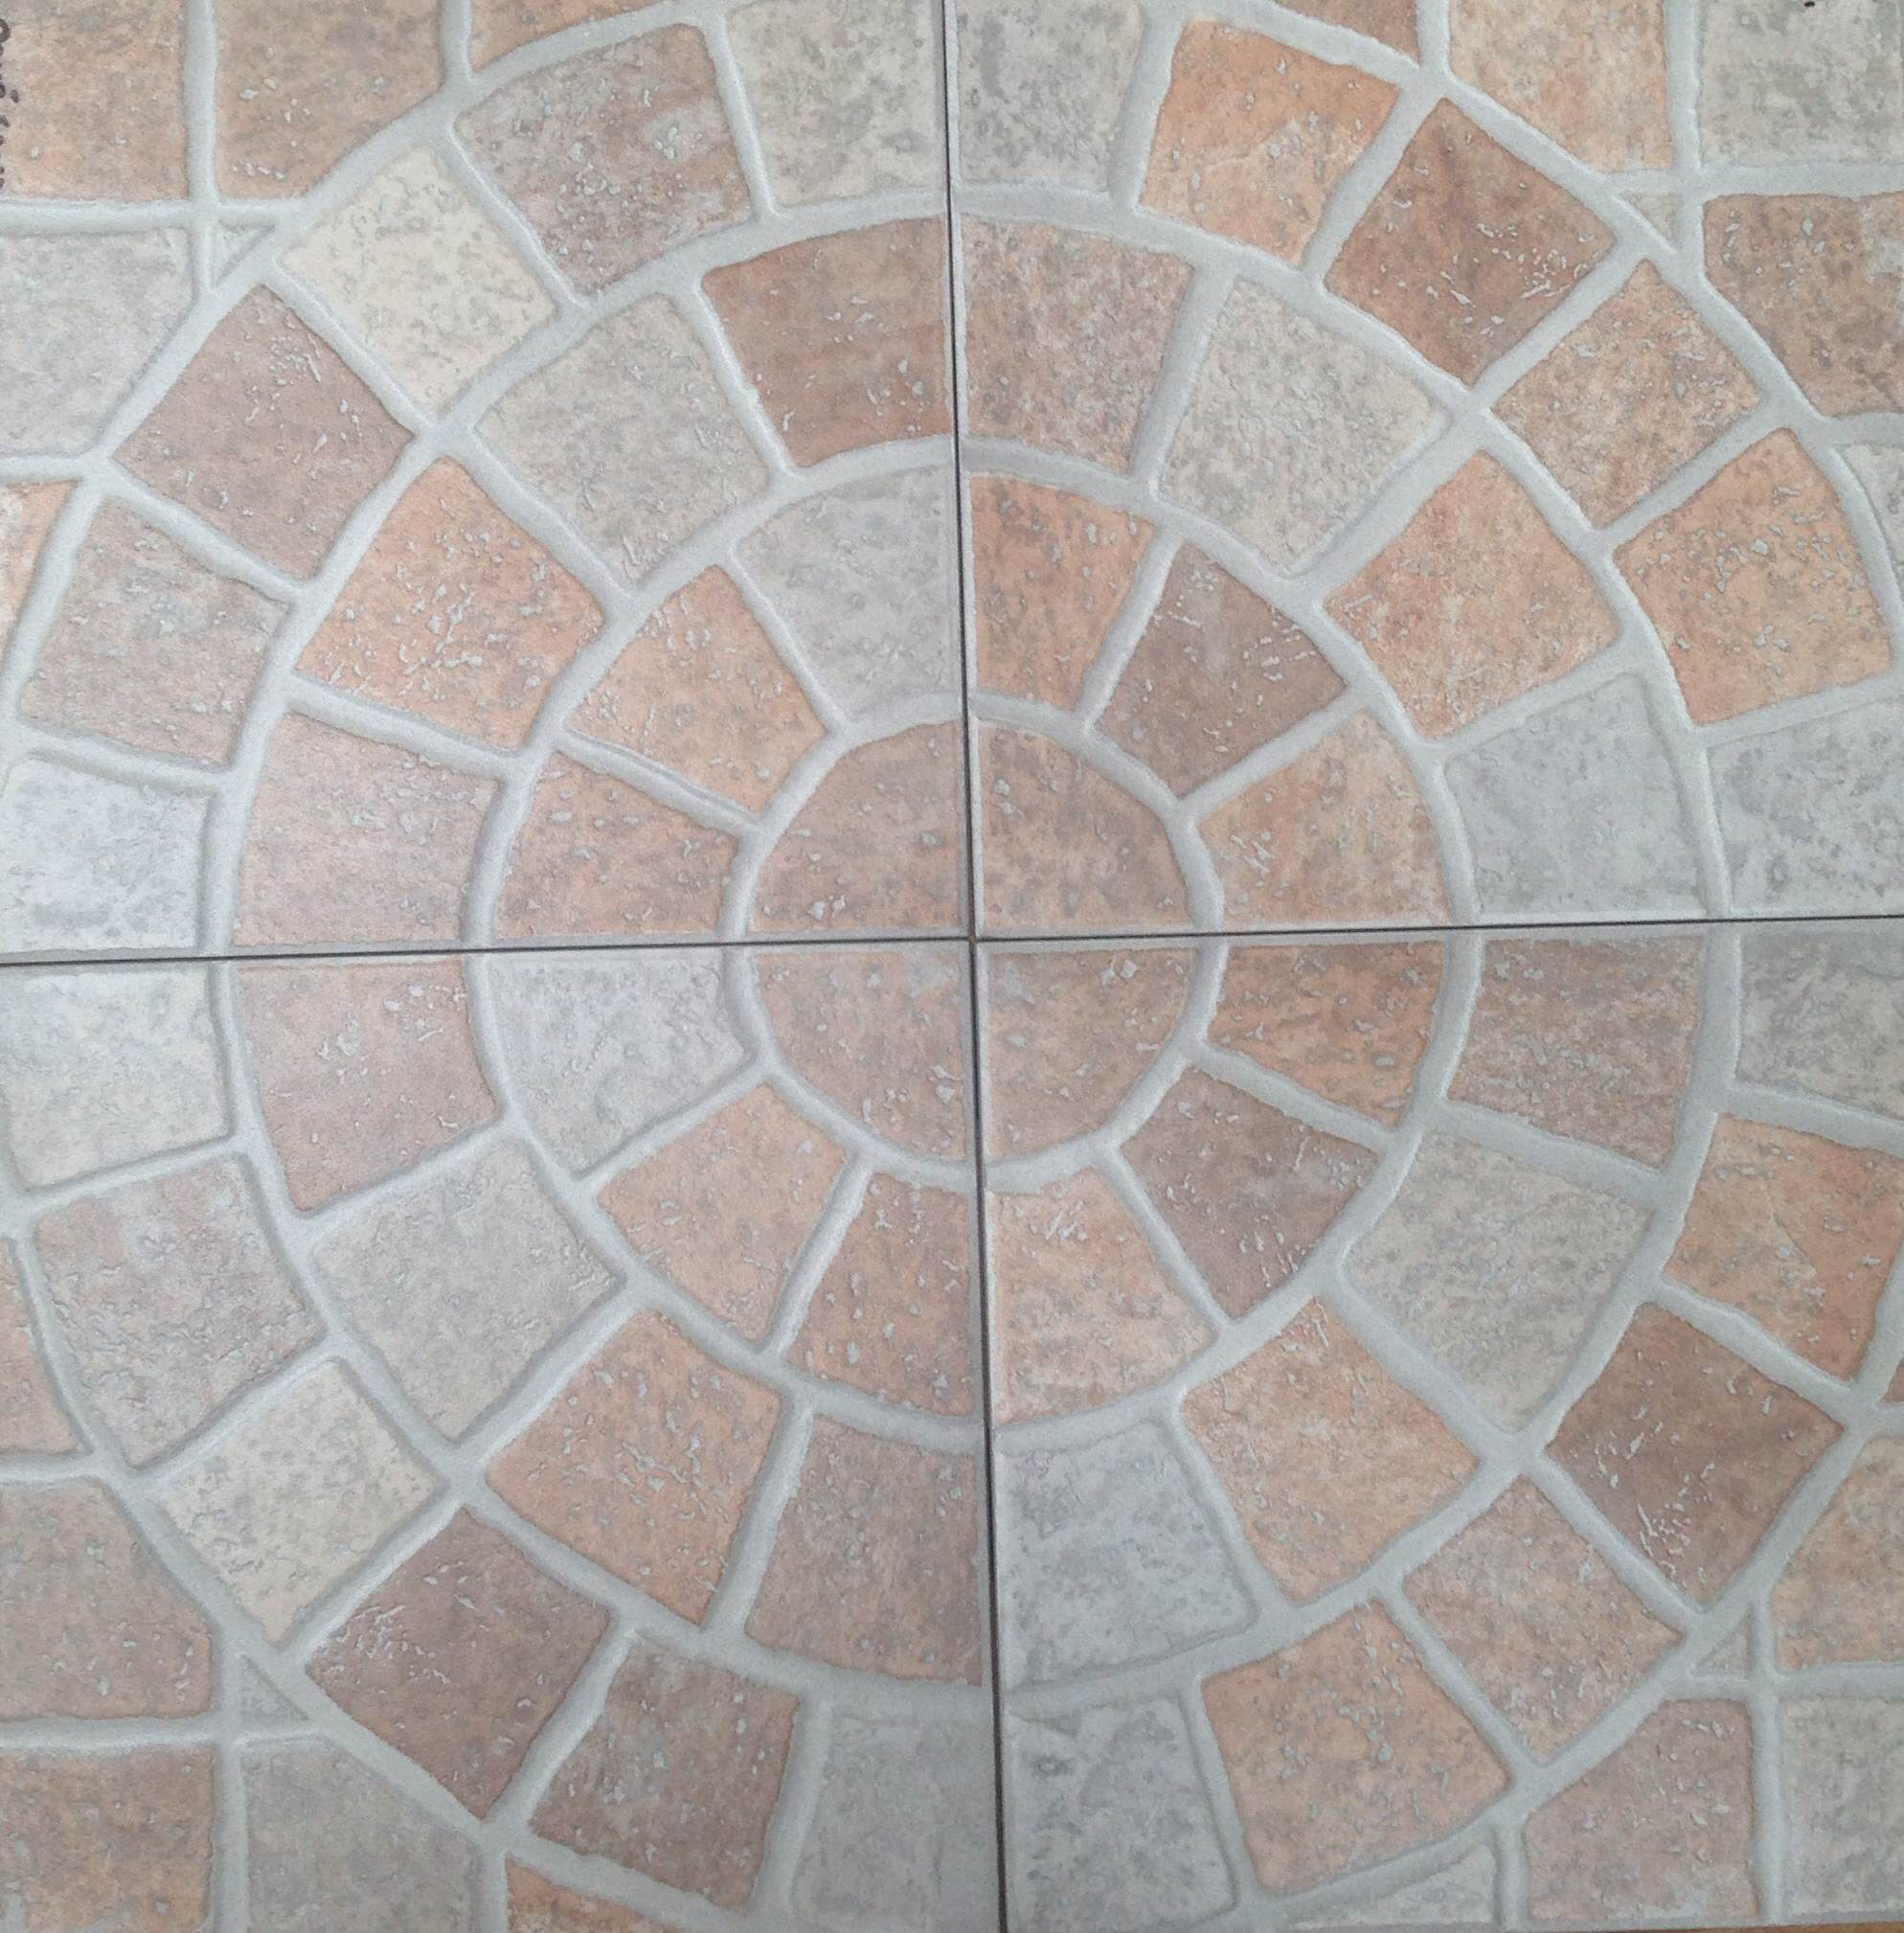 Pave sand 31x31 p i cubetto pavone grigio de rosa srl - Piastrelle seconda scelta ...